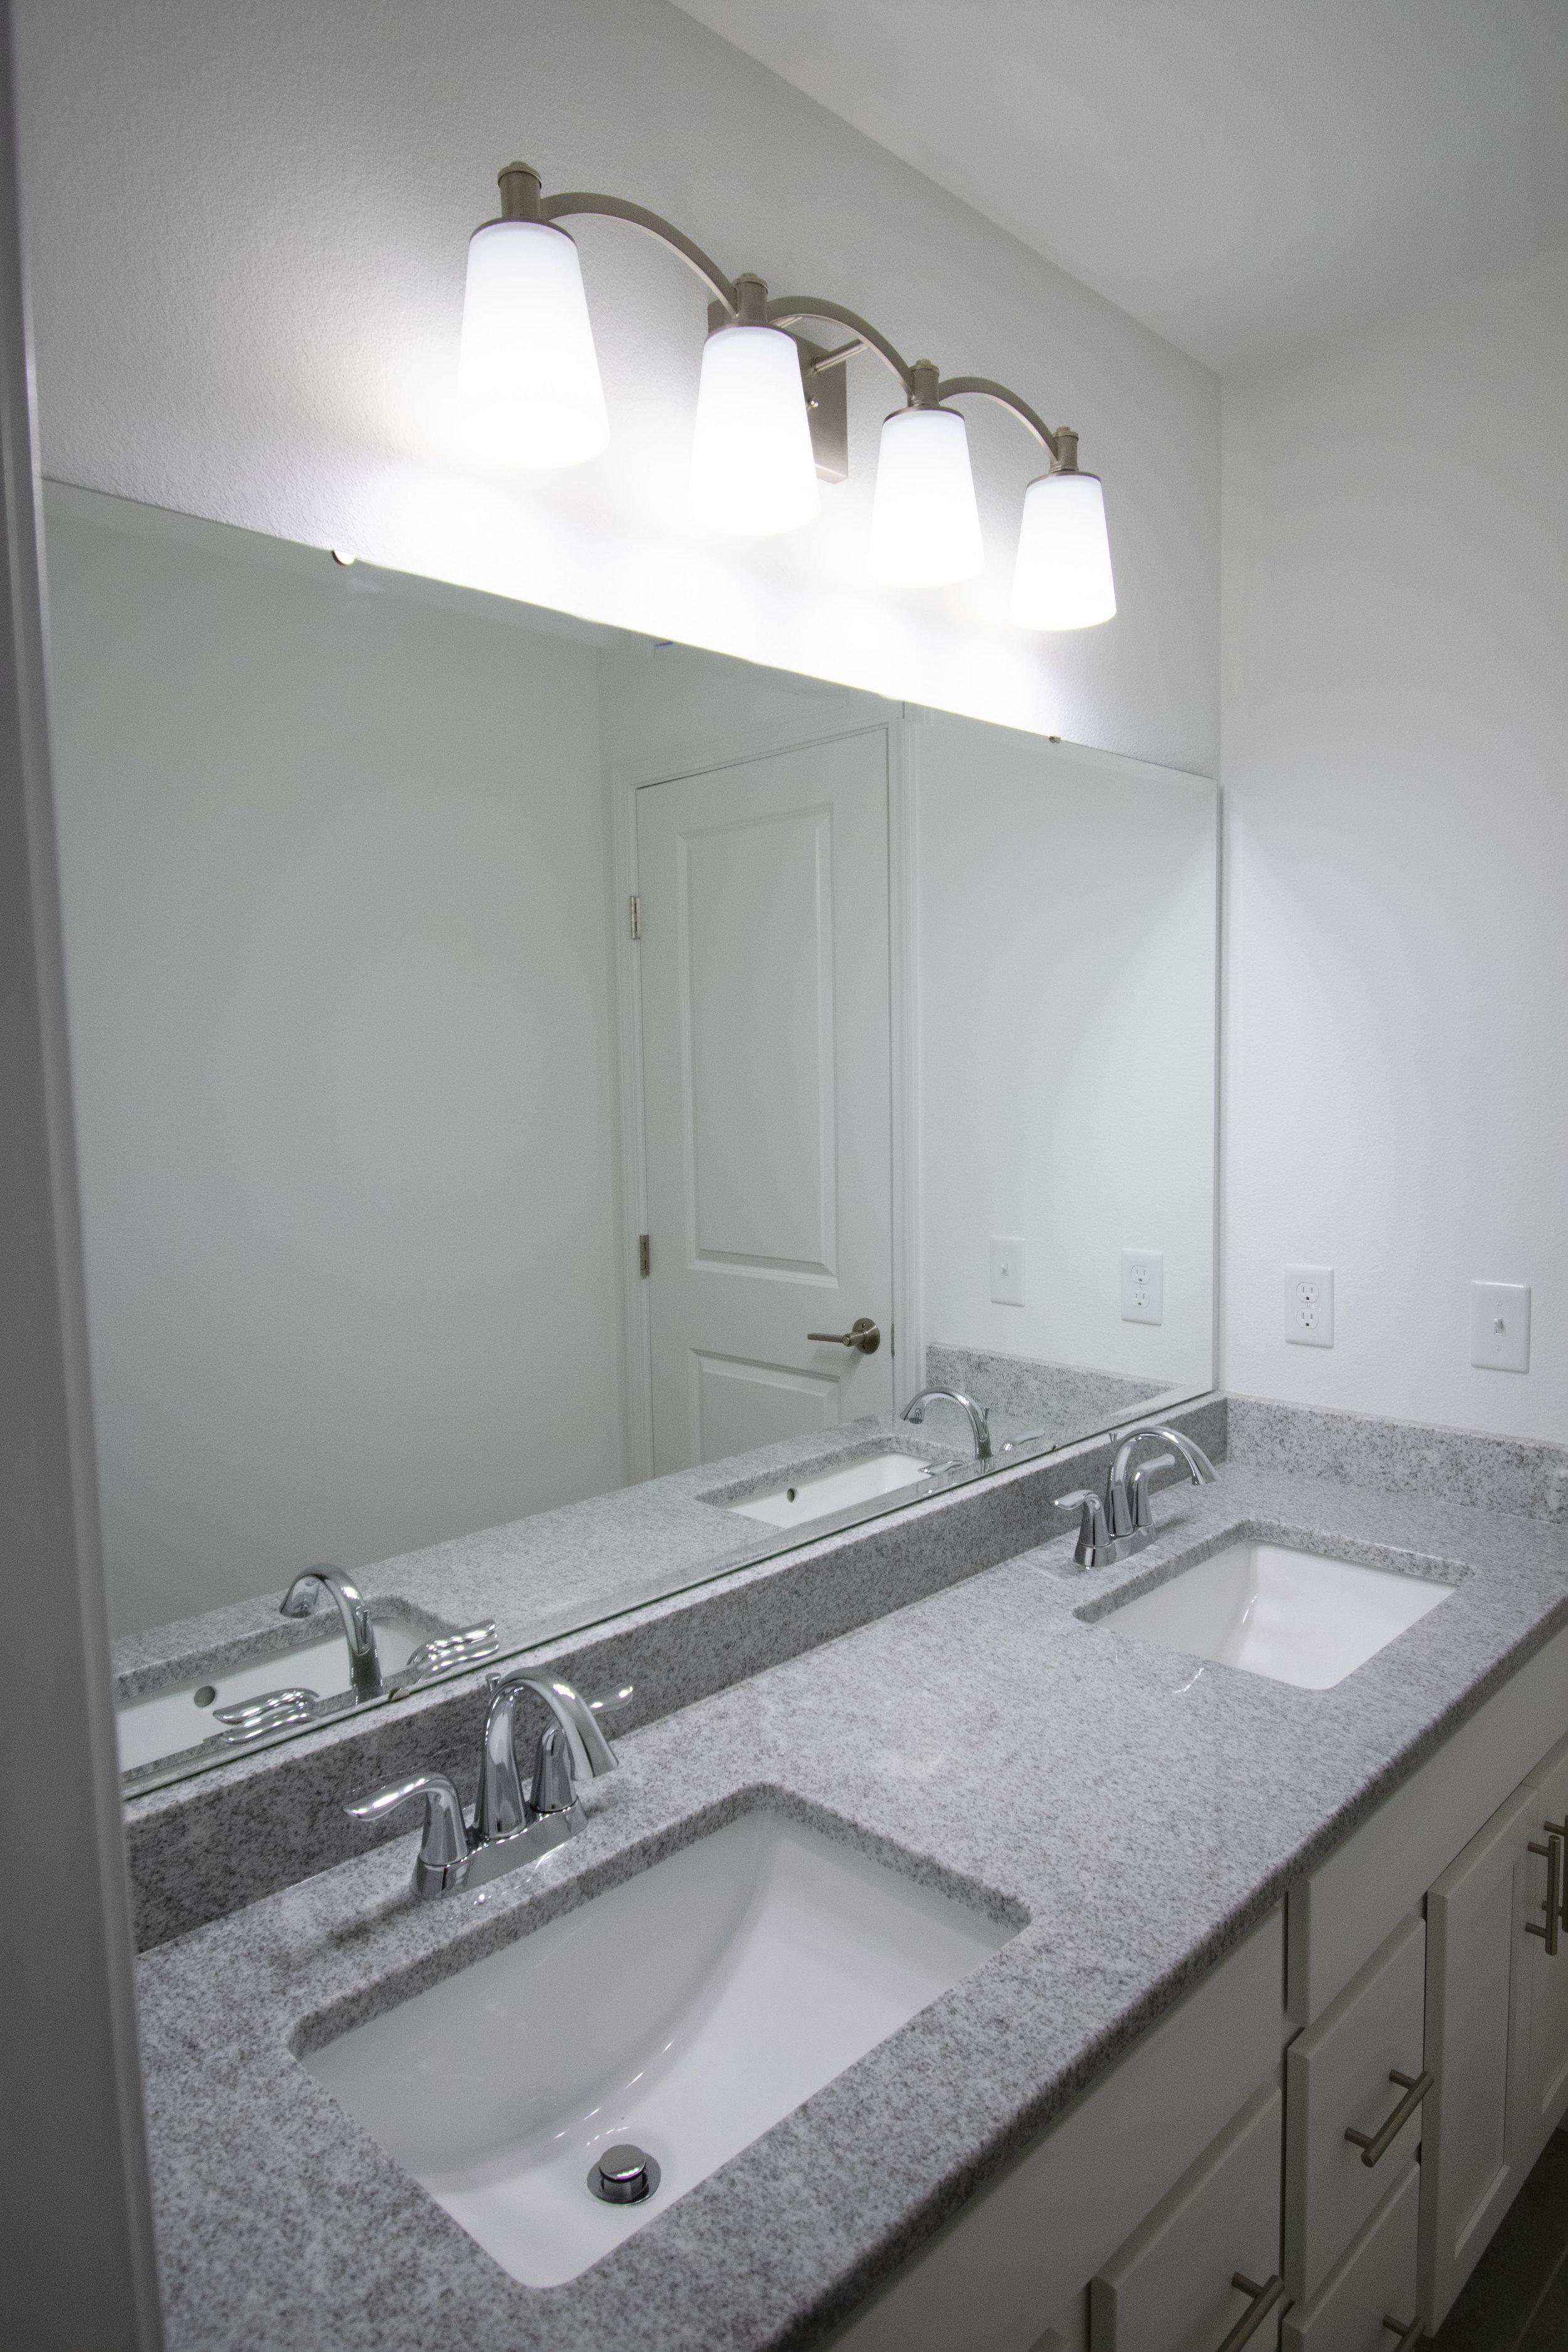 Bathroom Mirror 6-18-18.jpg